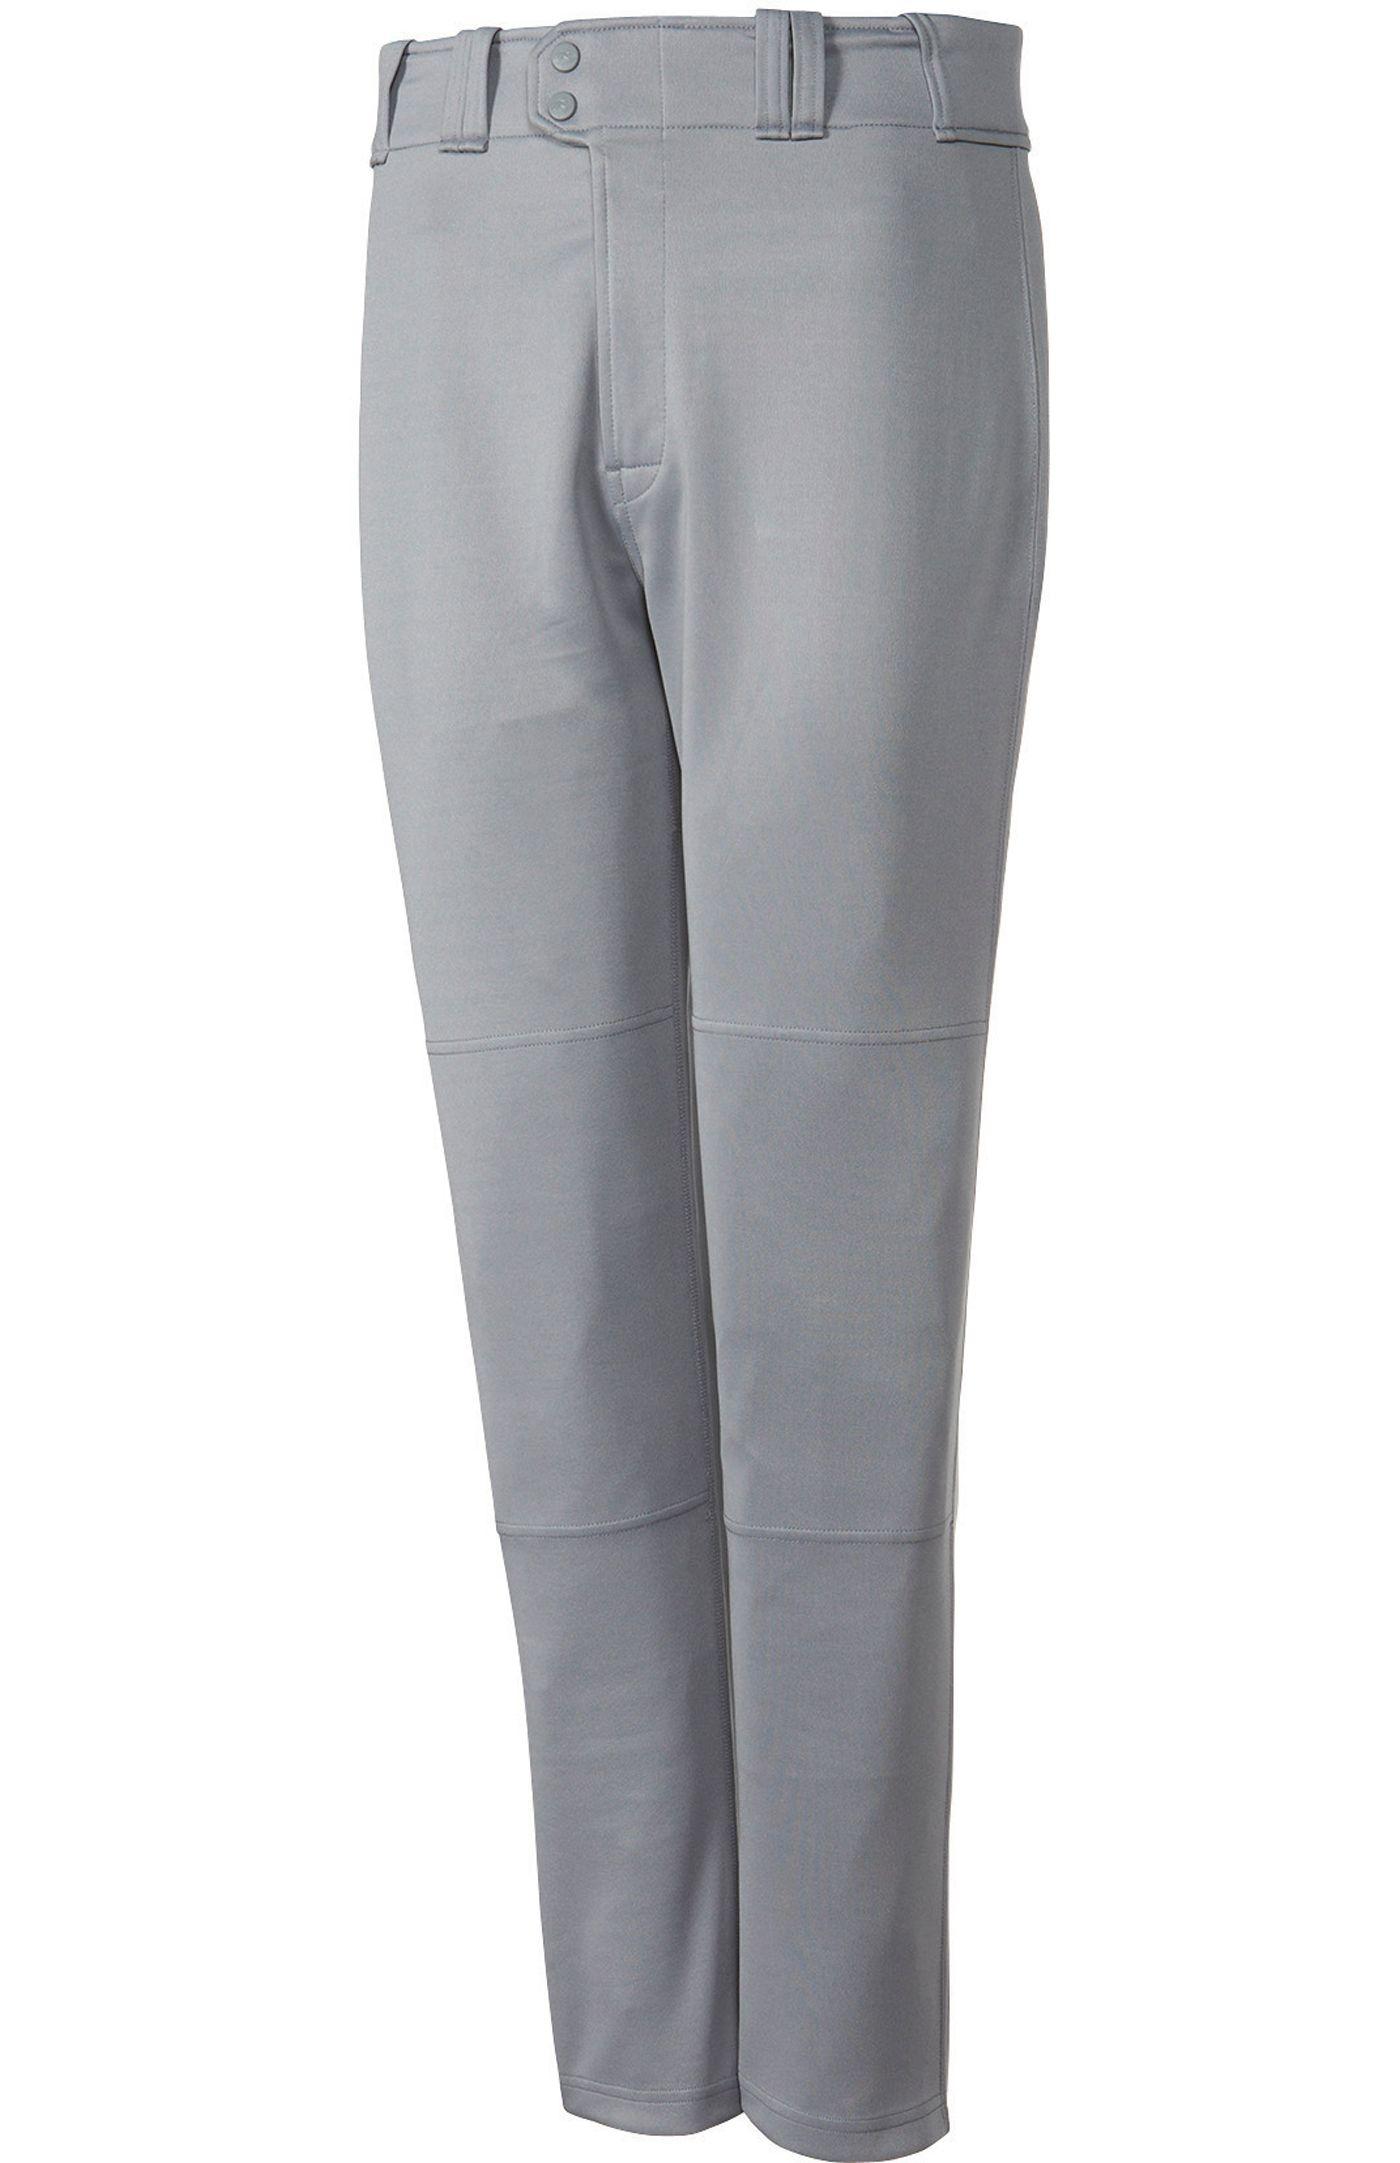 Rawlings Men's PRO150 Baseball Pants